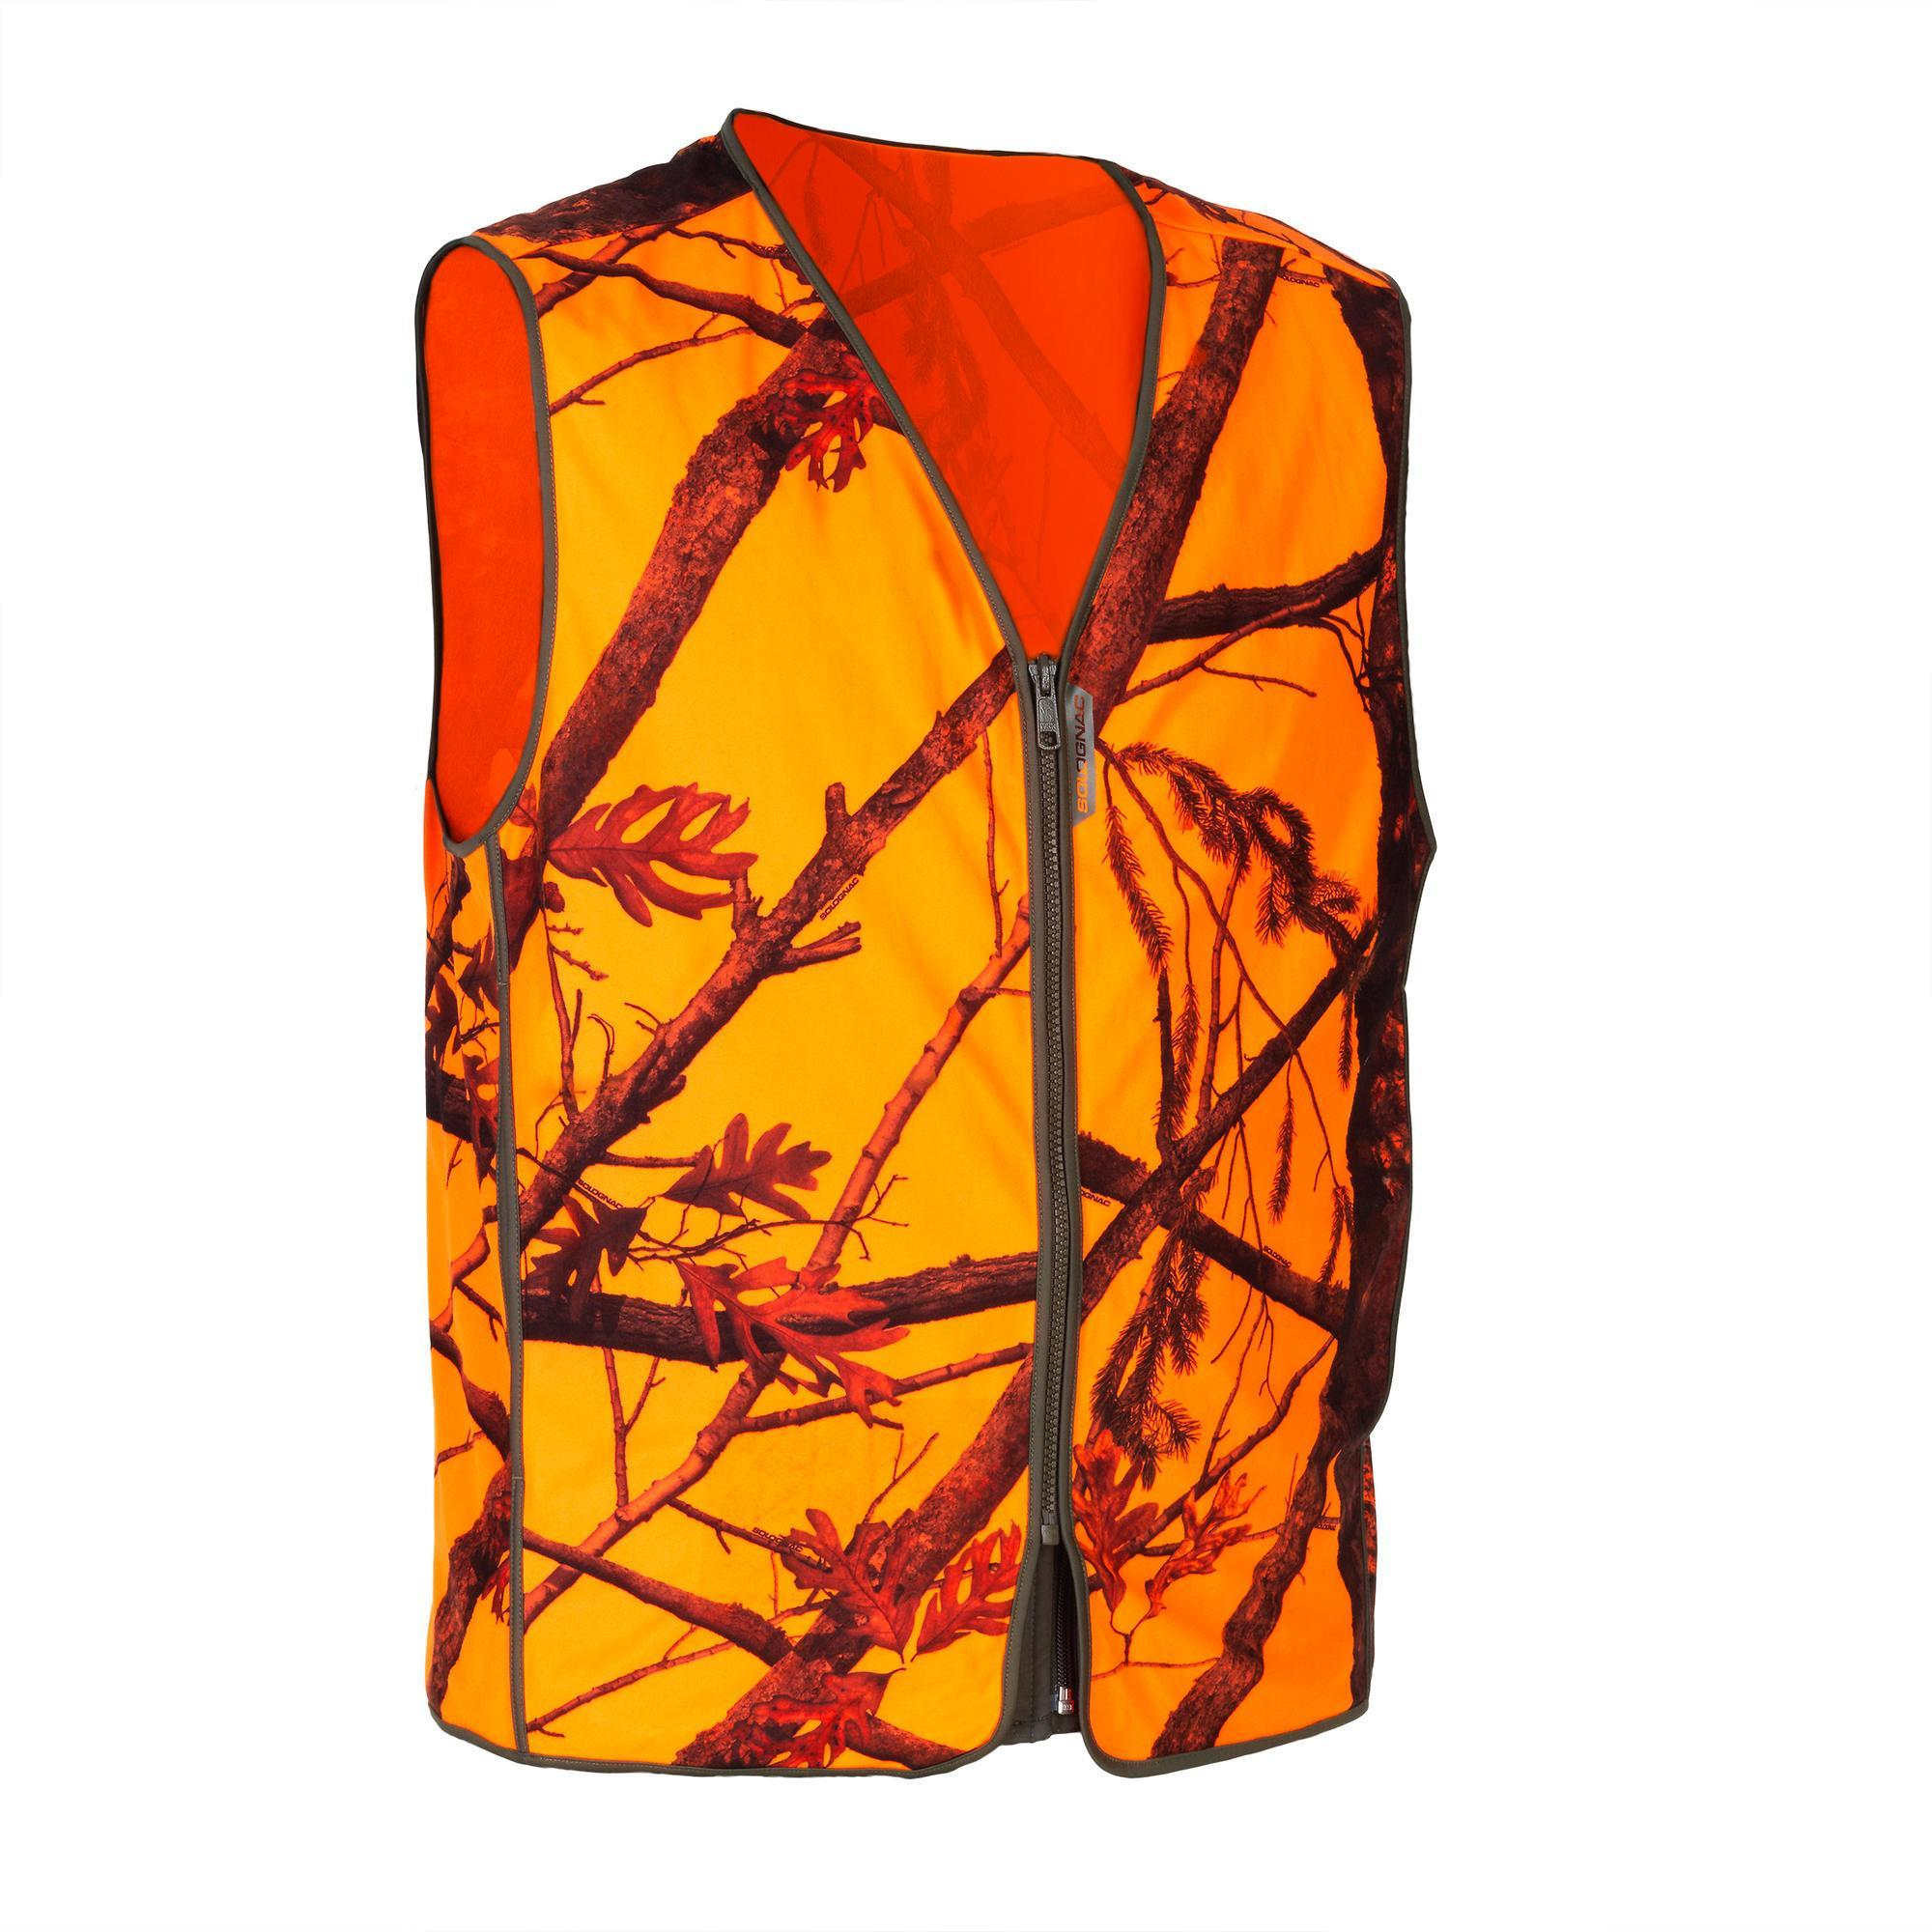 Jagdweste Compact camouflage orange | Sportbekleidung > Sportwesten > Jagdwesten | Orange | Solognac